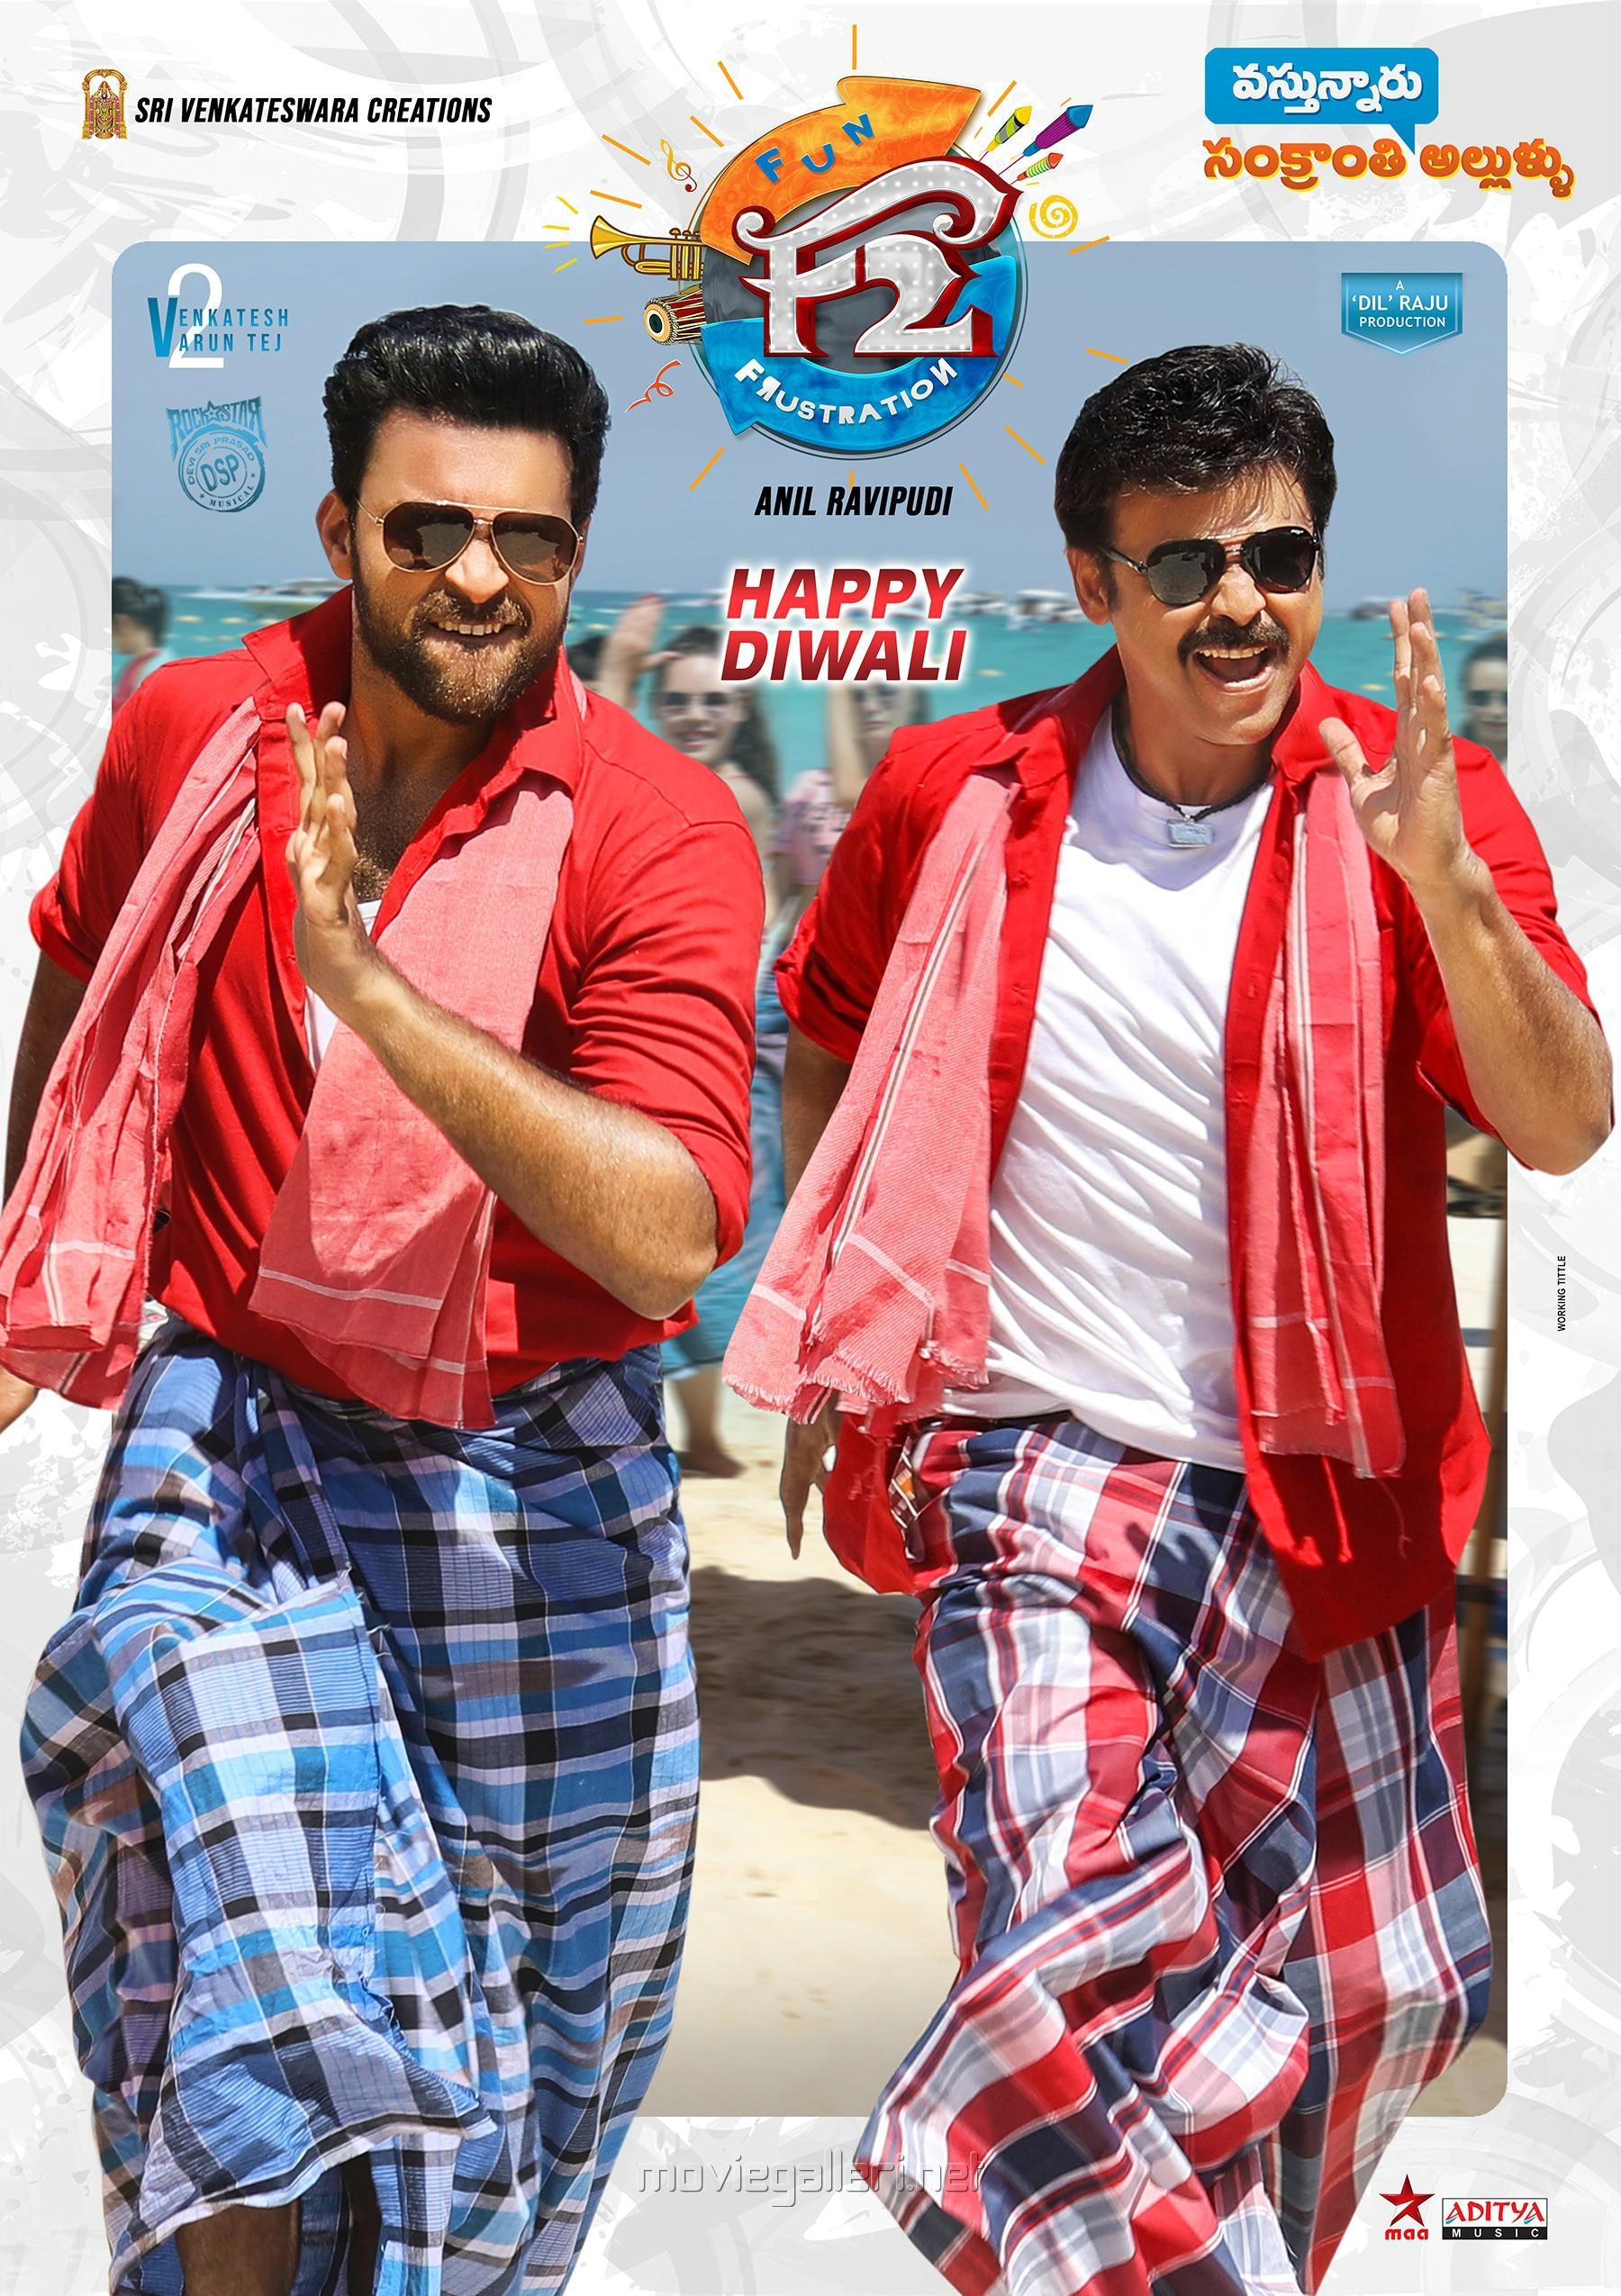 Venkatesh Varun Tej F2 Fun and Frustration Movie Diwali Wishes Poster HD